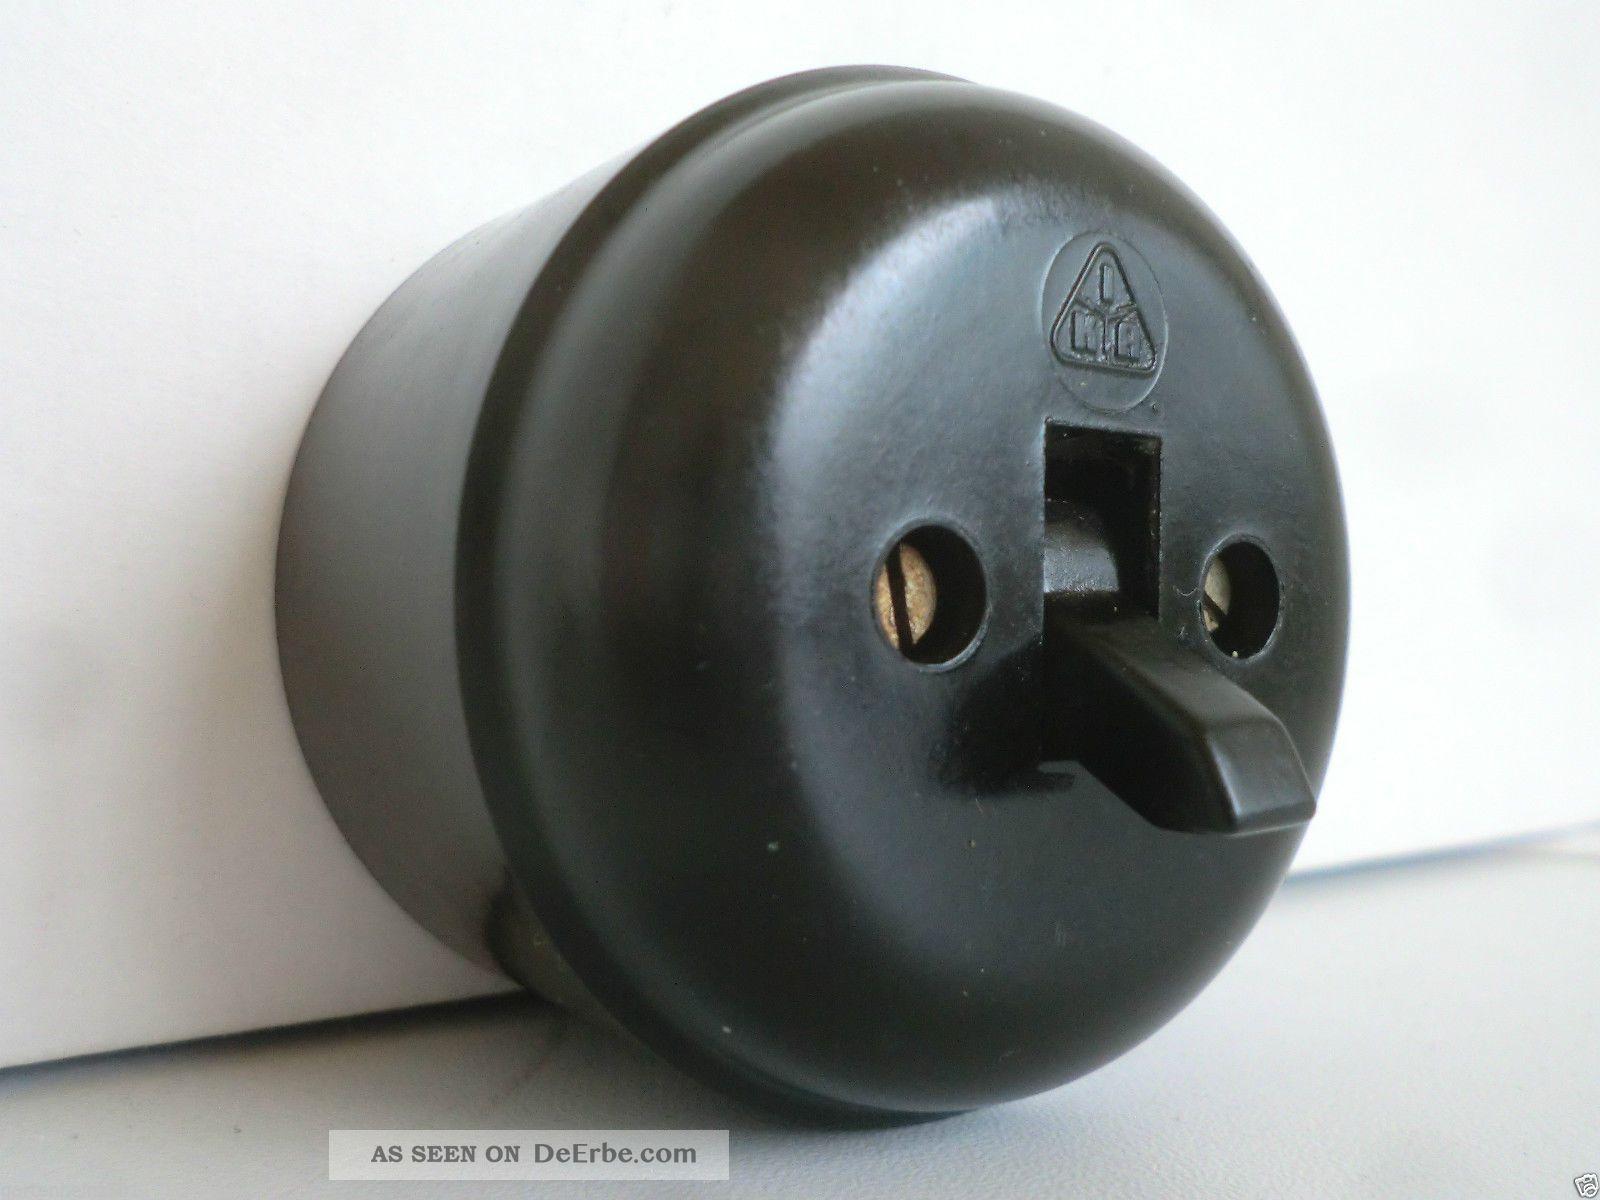 bakelit schalter lichtschalter kippschalter aufputz art. Black Bedroom Furniture Sets. Home Design Ideas